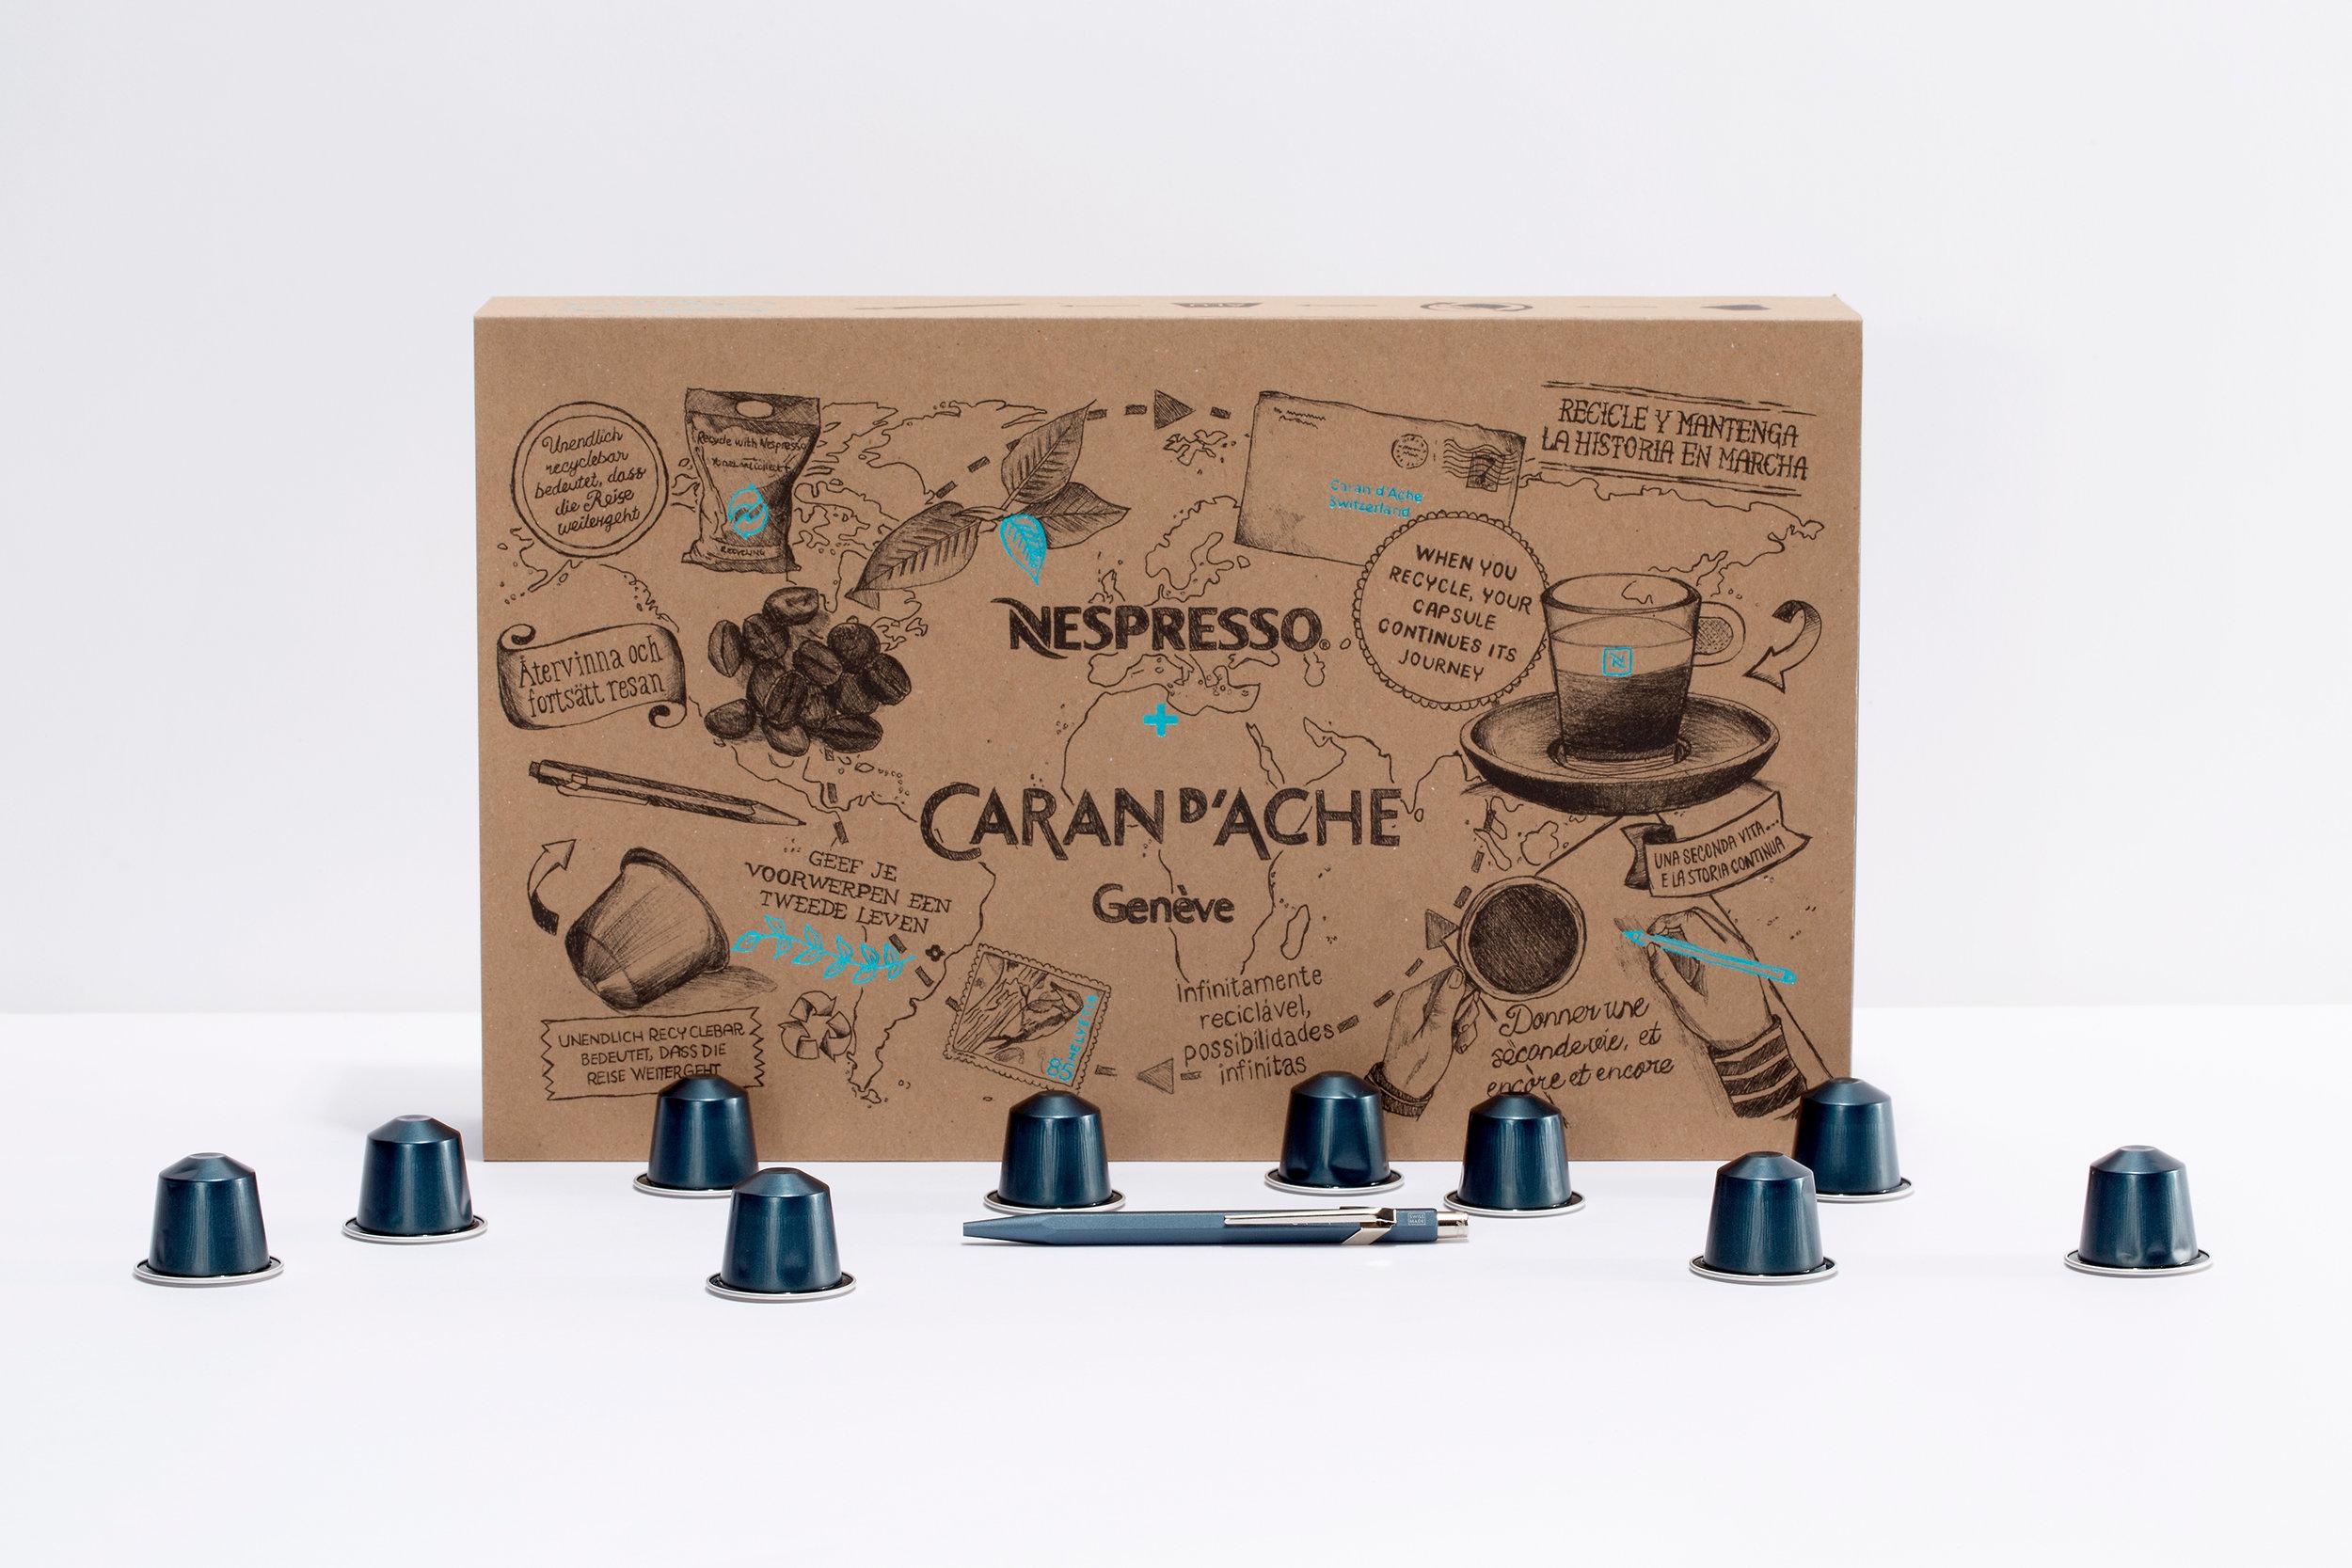 nespresso_carandache_box_2.jpg